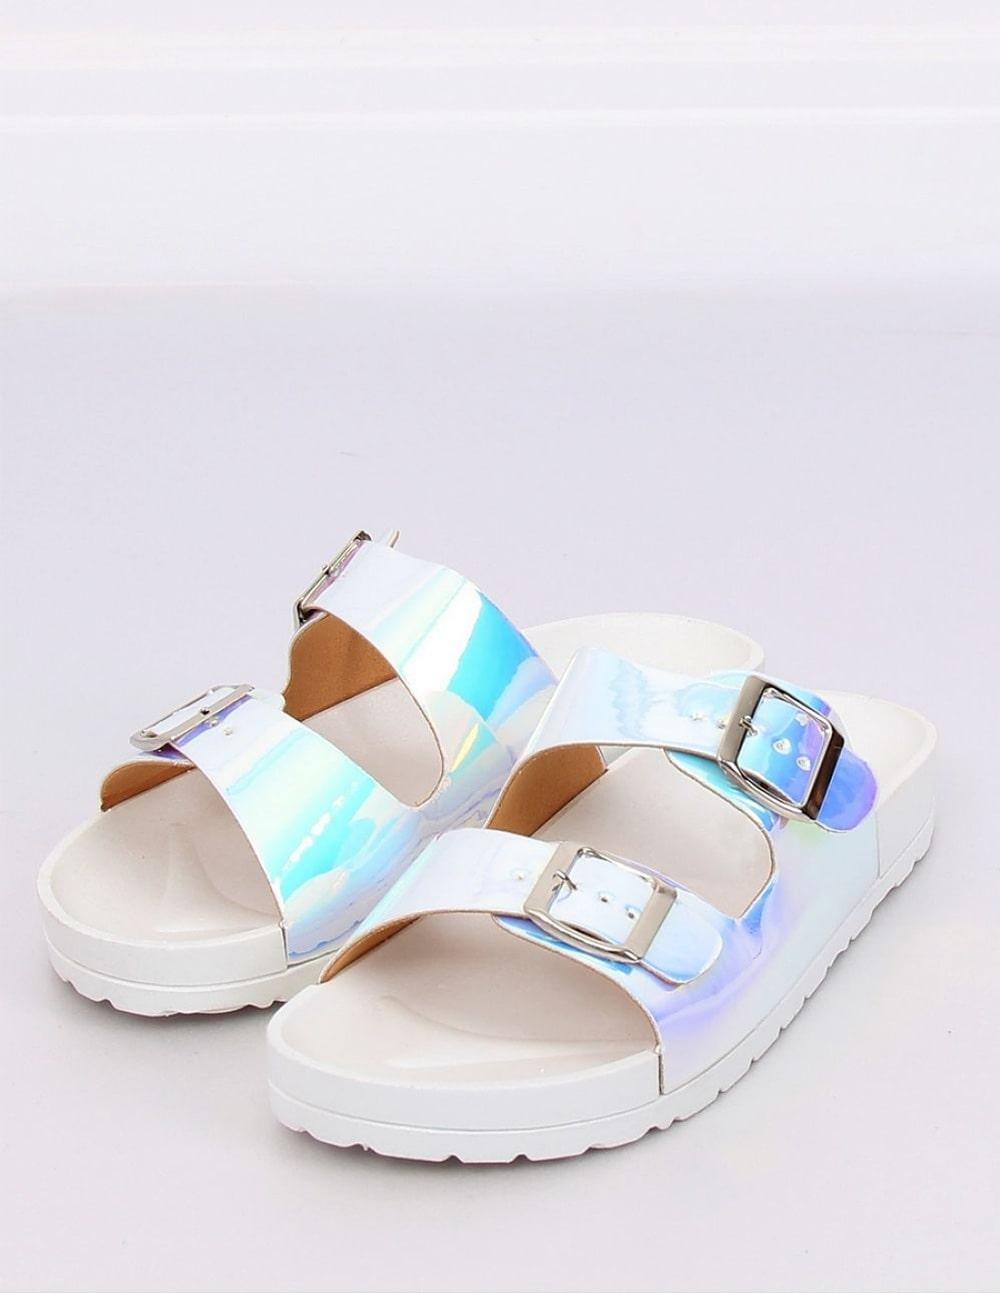 Papuci albi cu detalii multicolore